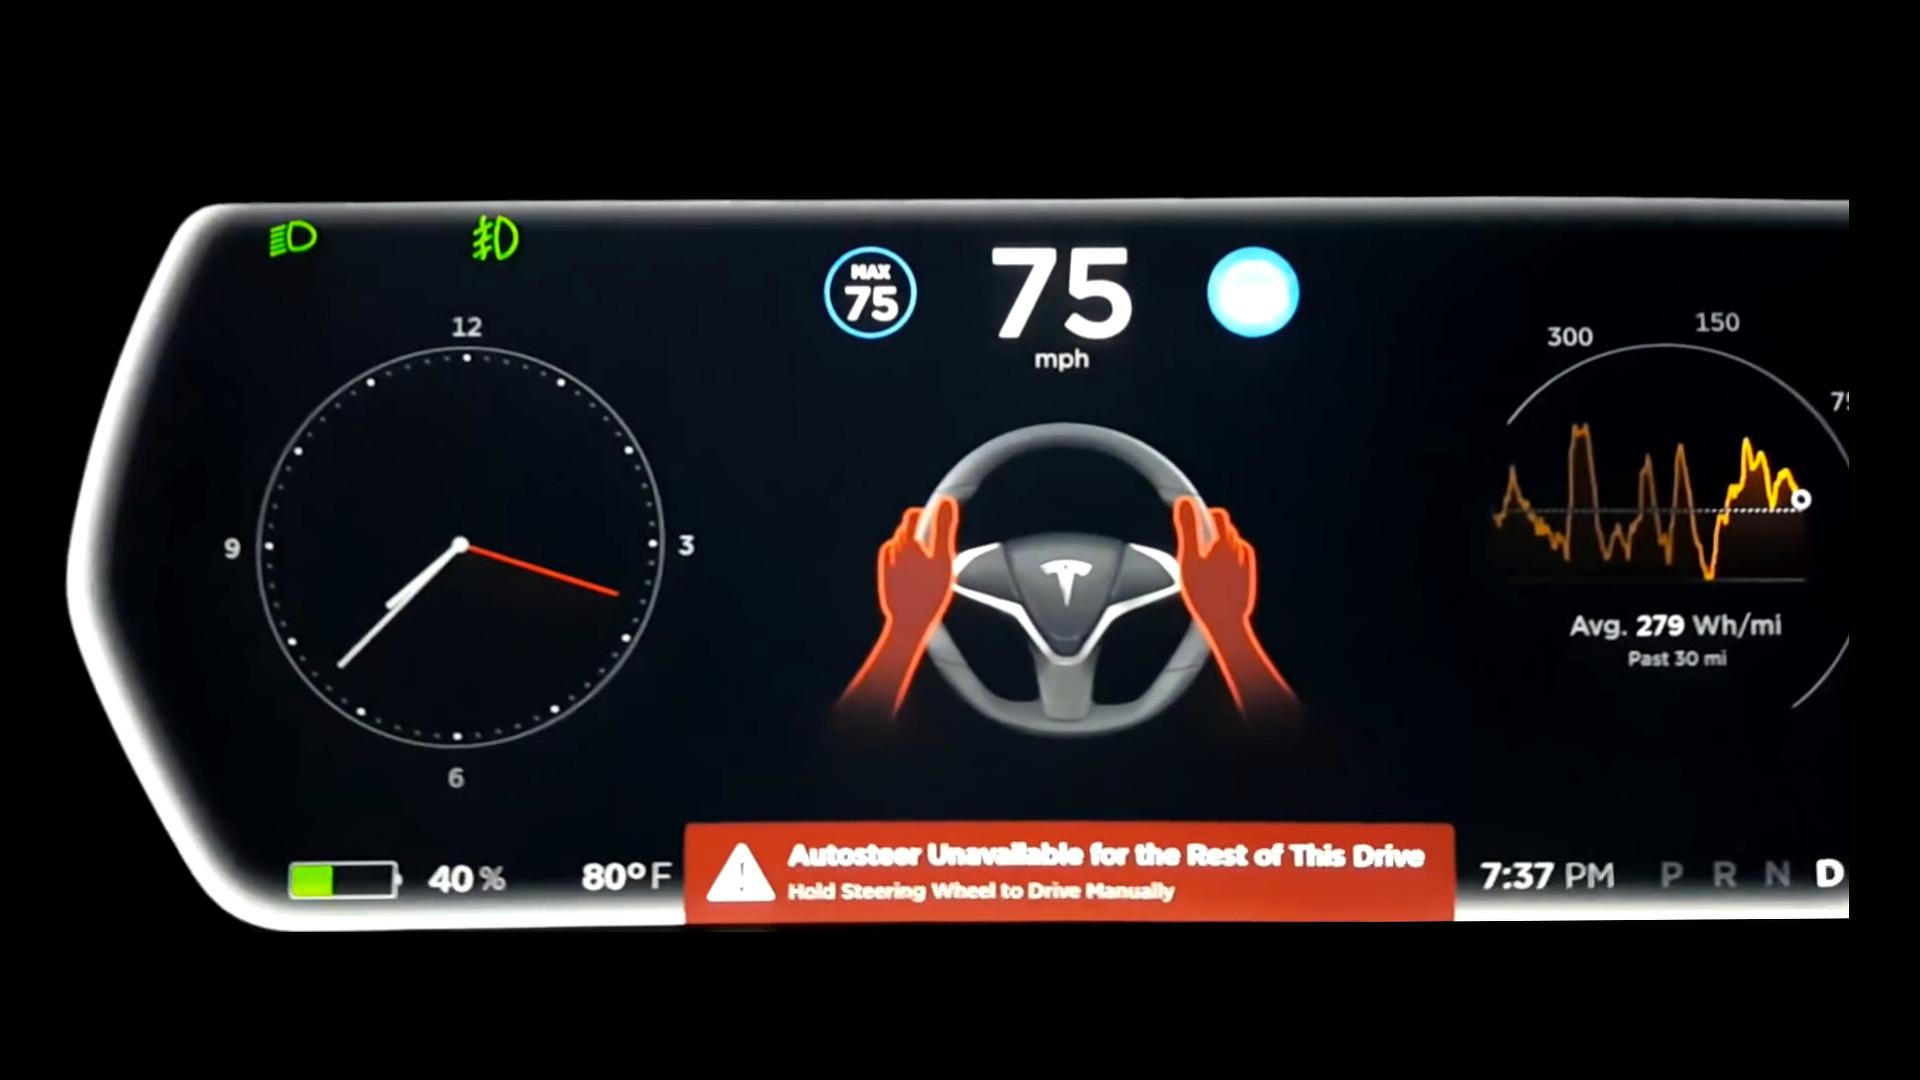 Tesla Autopilot v8.0